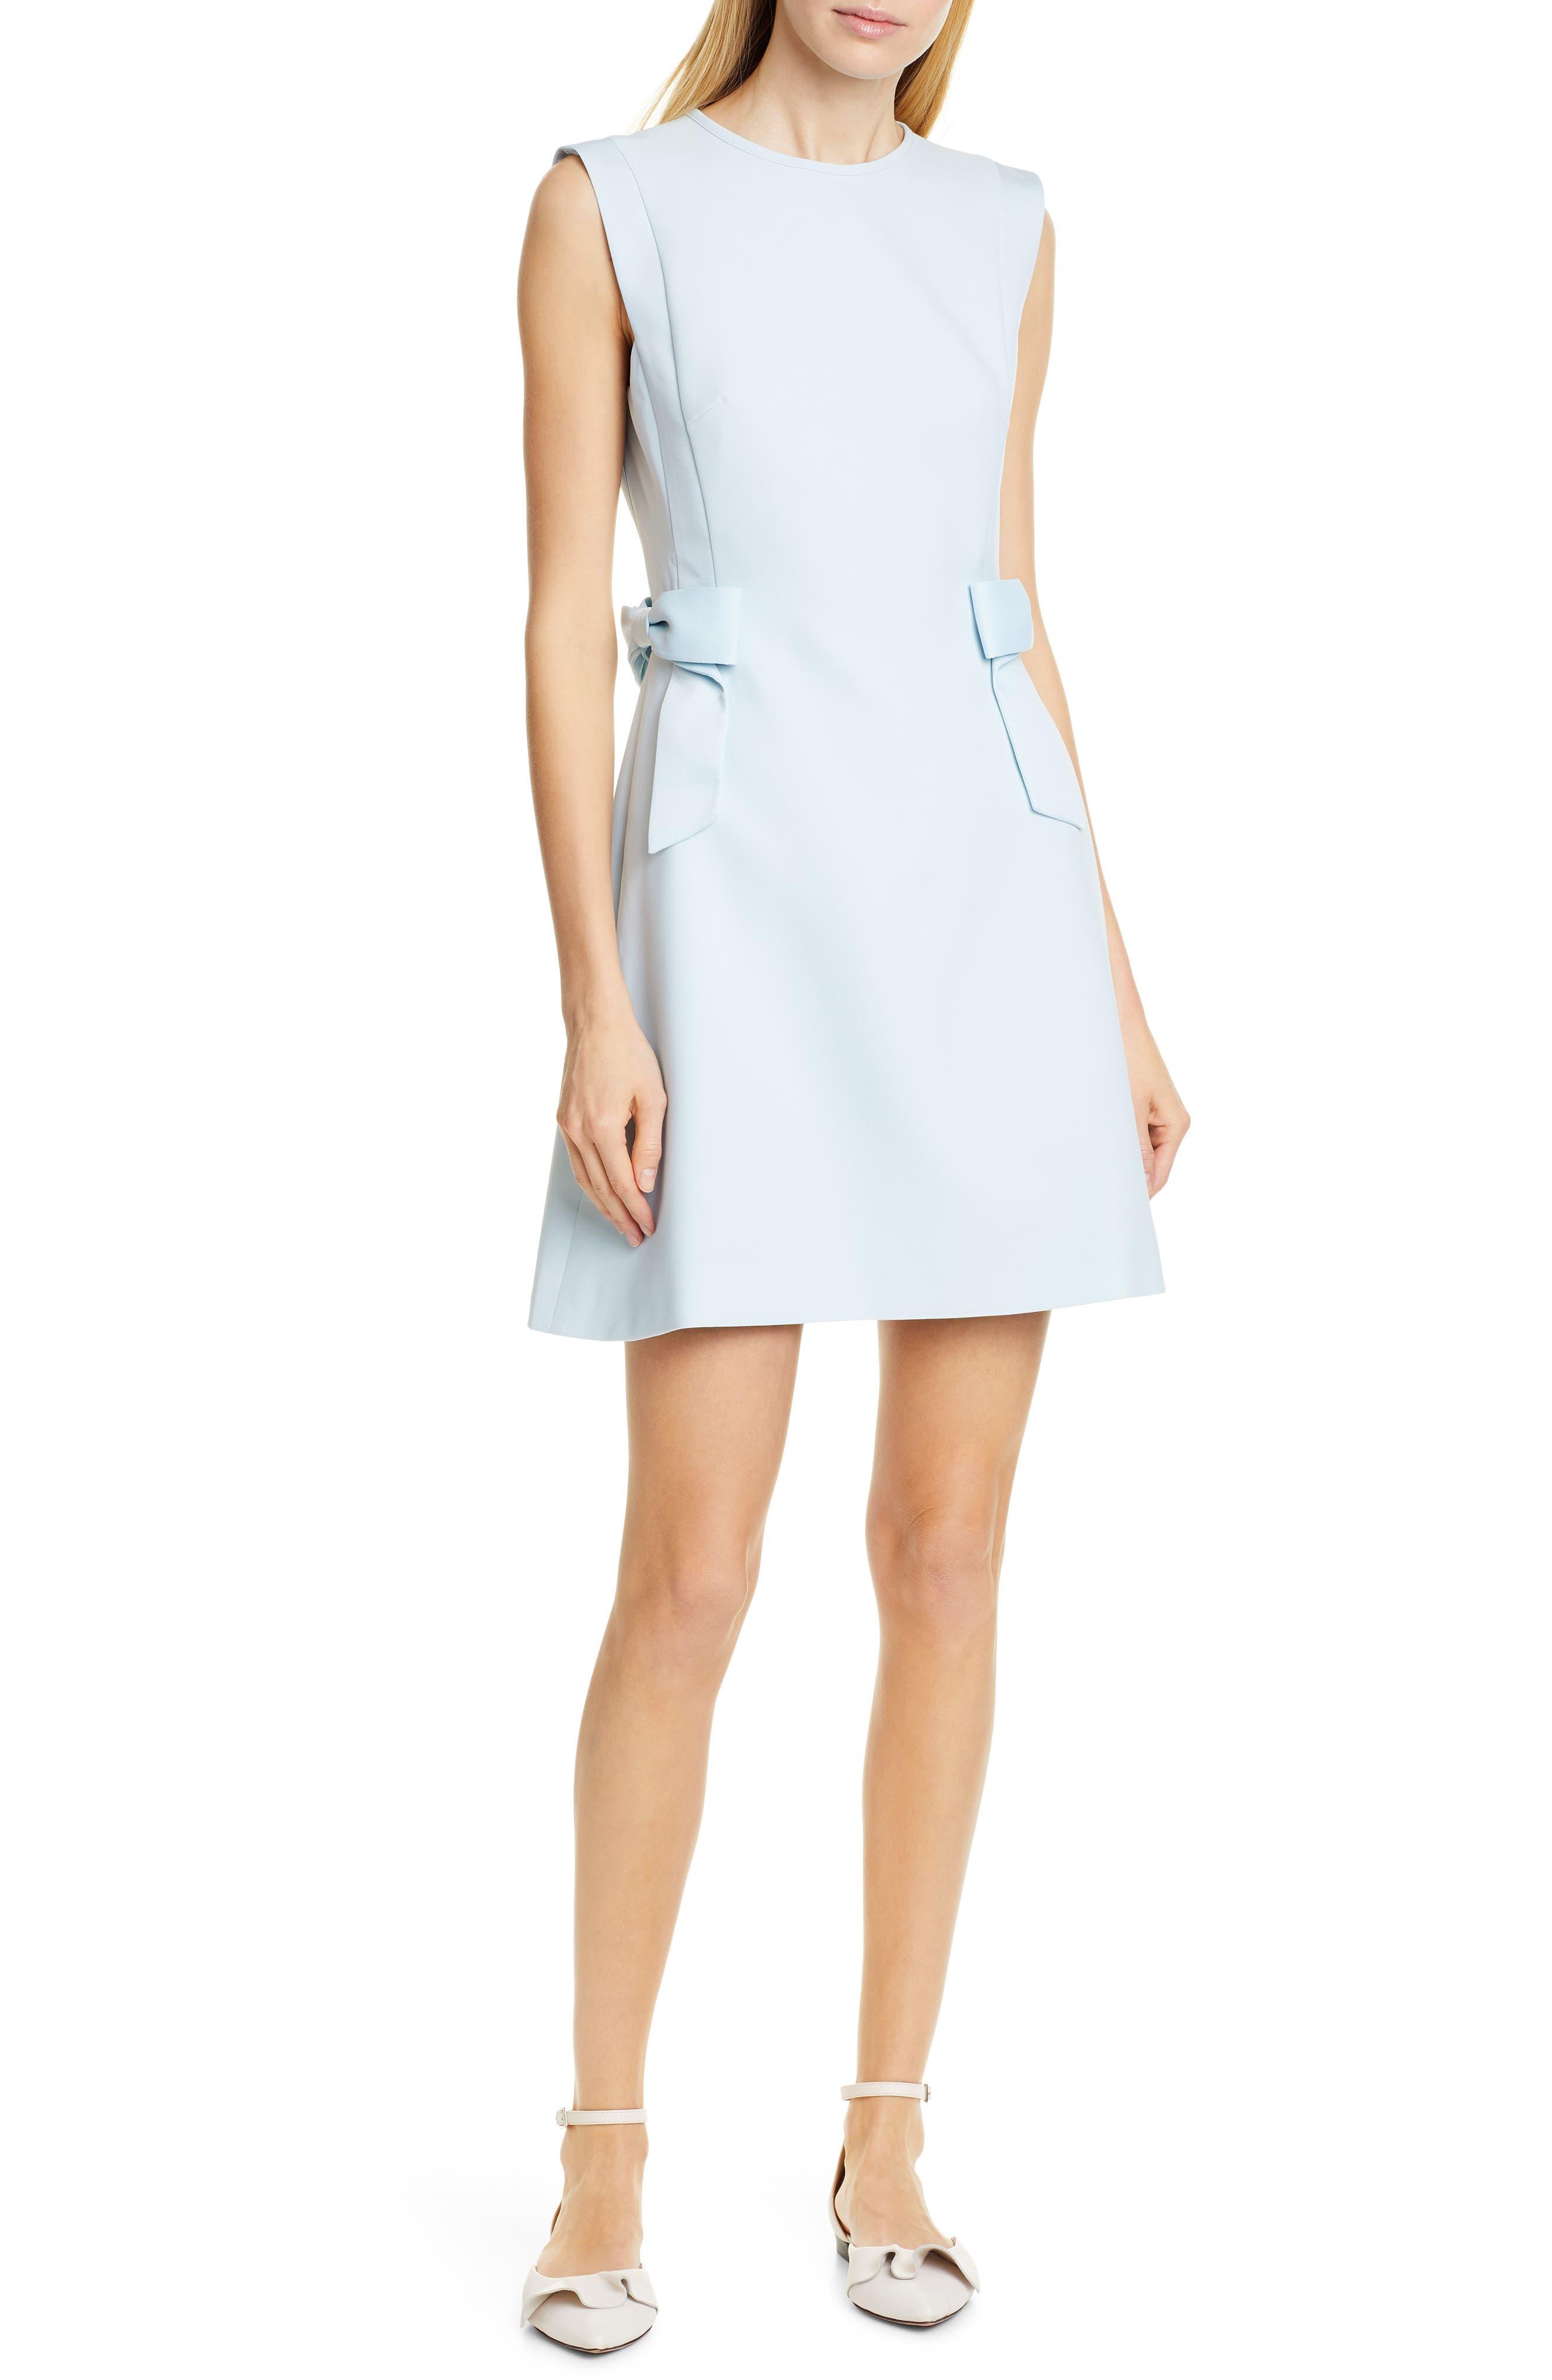 TED BAKER LONDON, Meline Side Bow Detail Dress, Main thumbnail 1, color, MINT